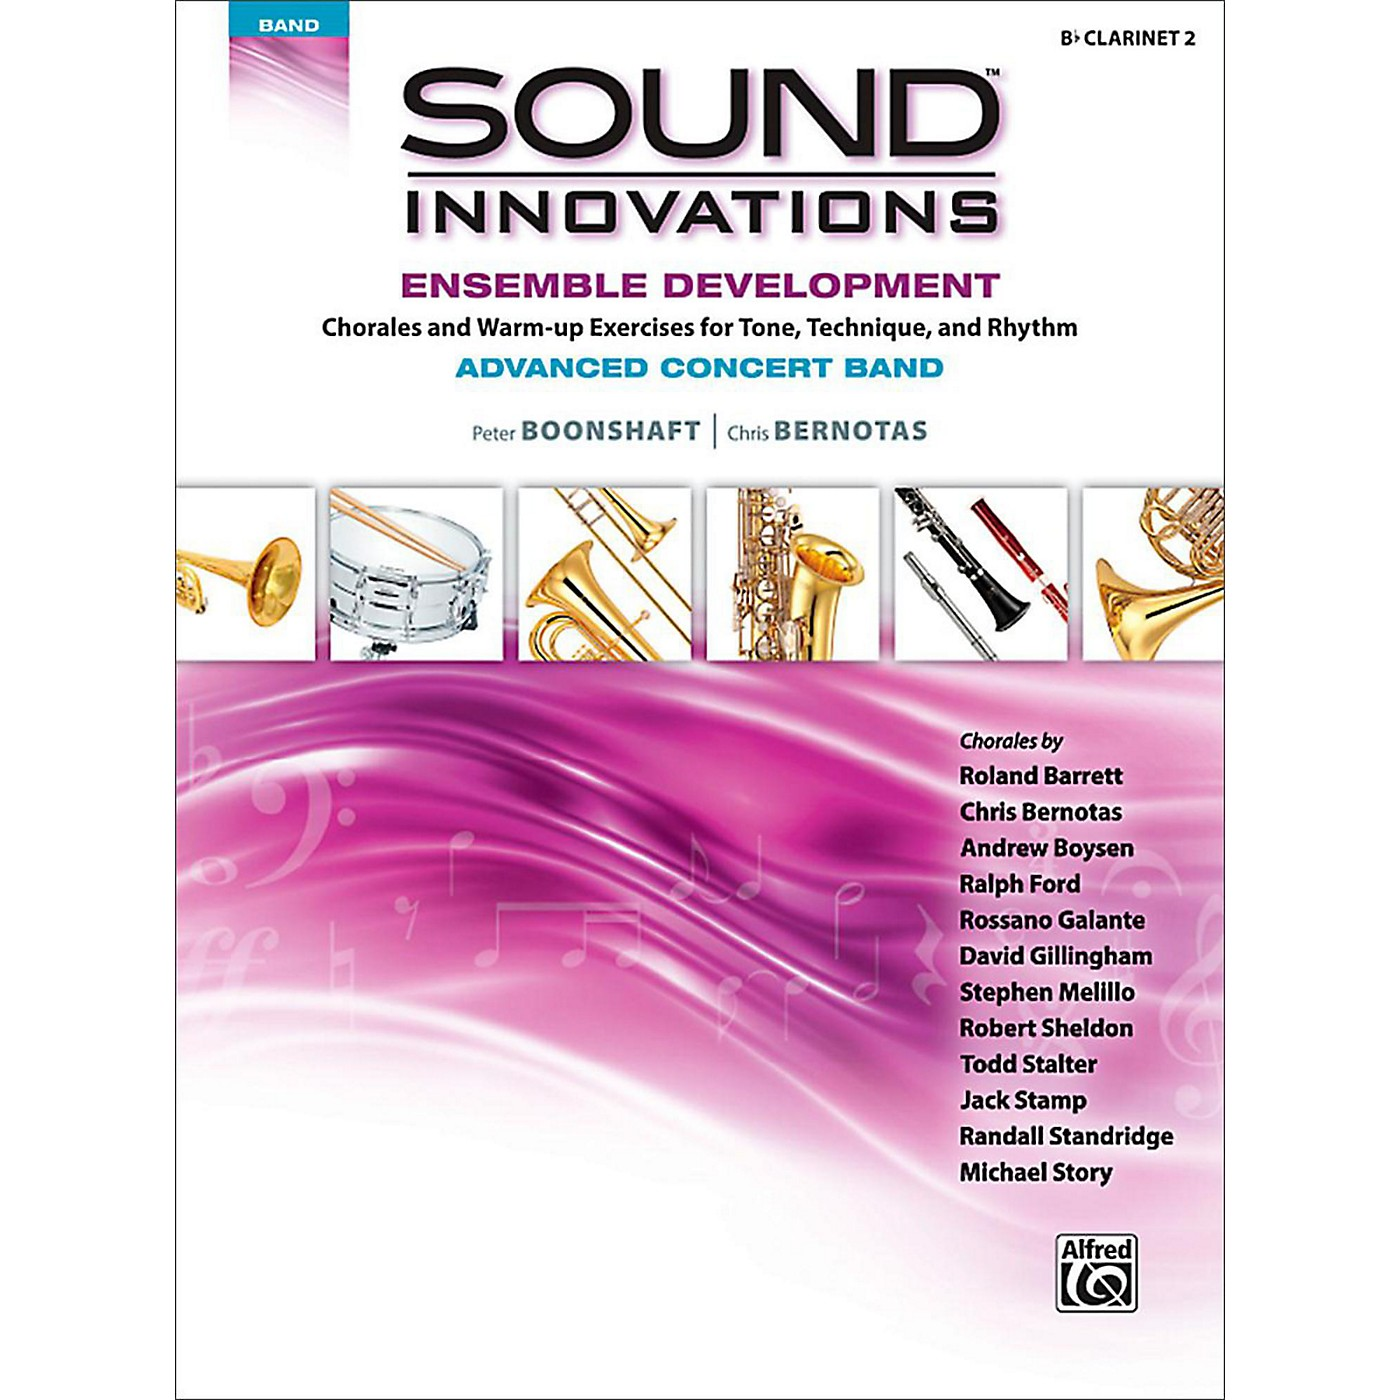 Alfred Sound Innovations Concert Band Ensemble Development Advanced Clarinet 2 thumbnail